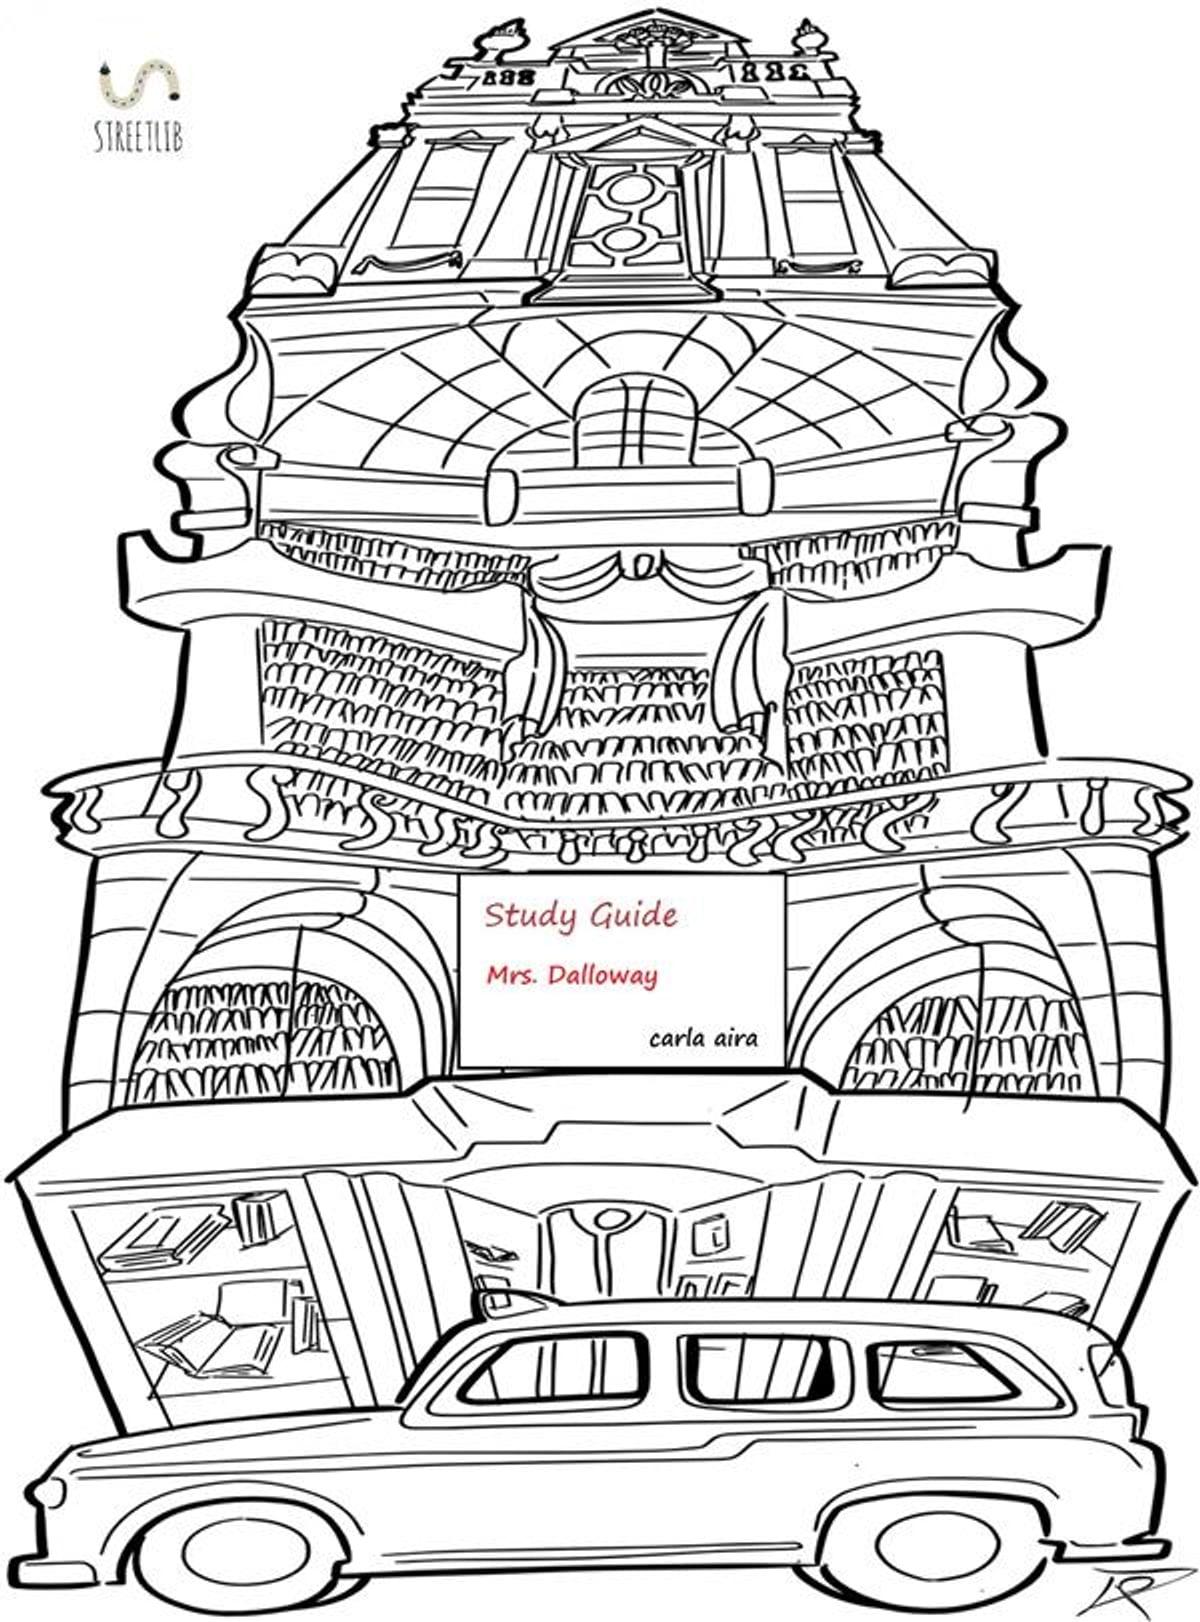 Study Guide Mrs Dalloway eBook by Carla Aira